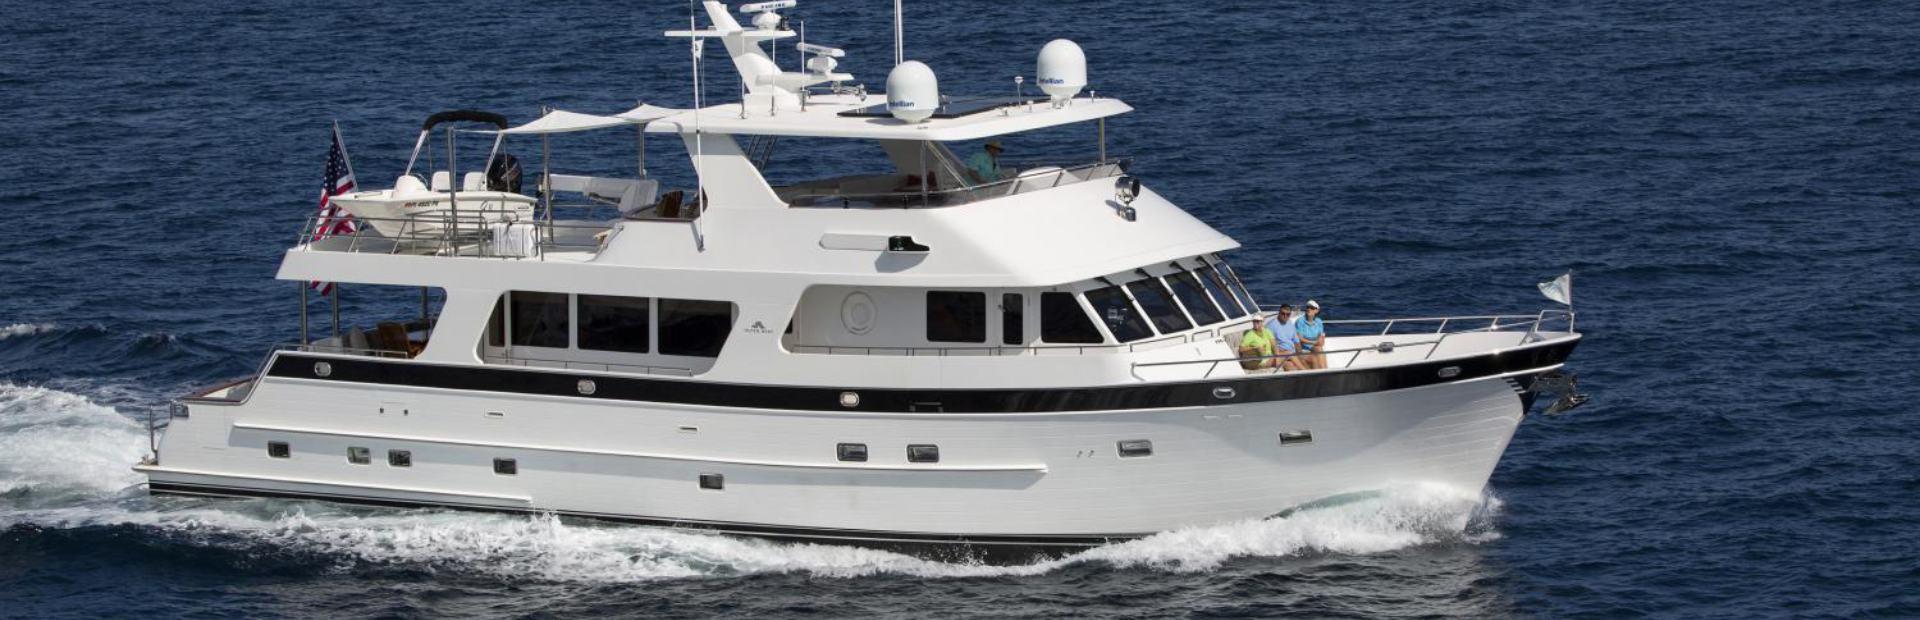 820 Cockpit Motoryacht Yacht Charter